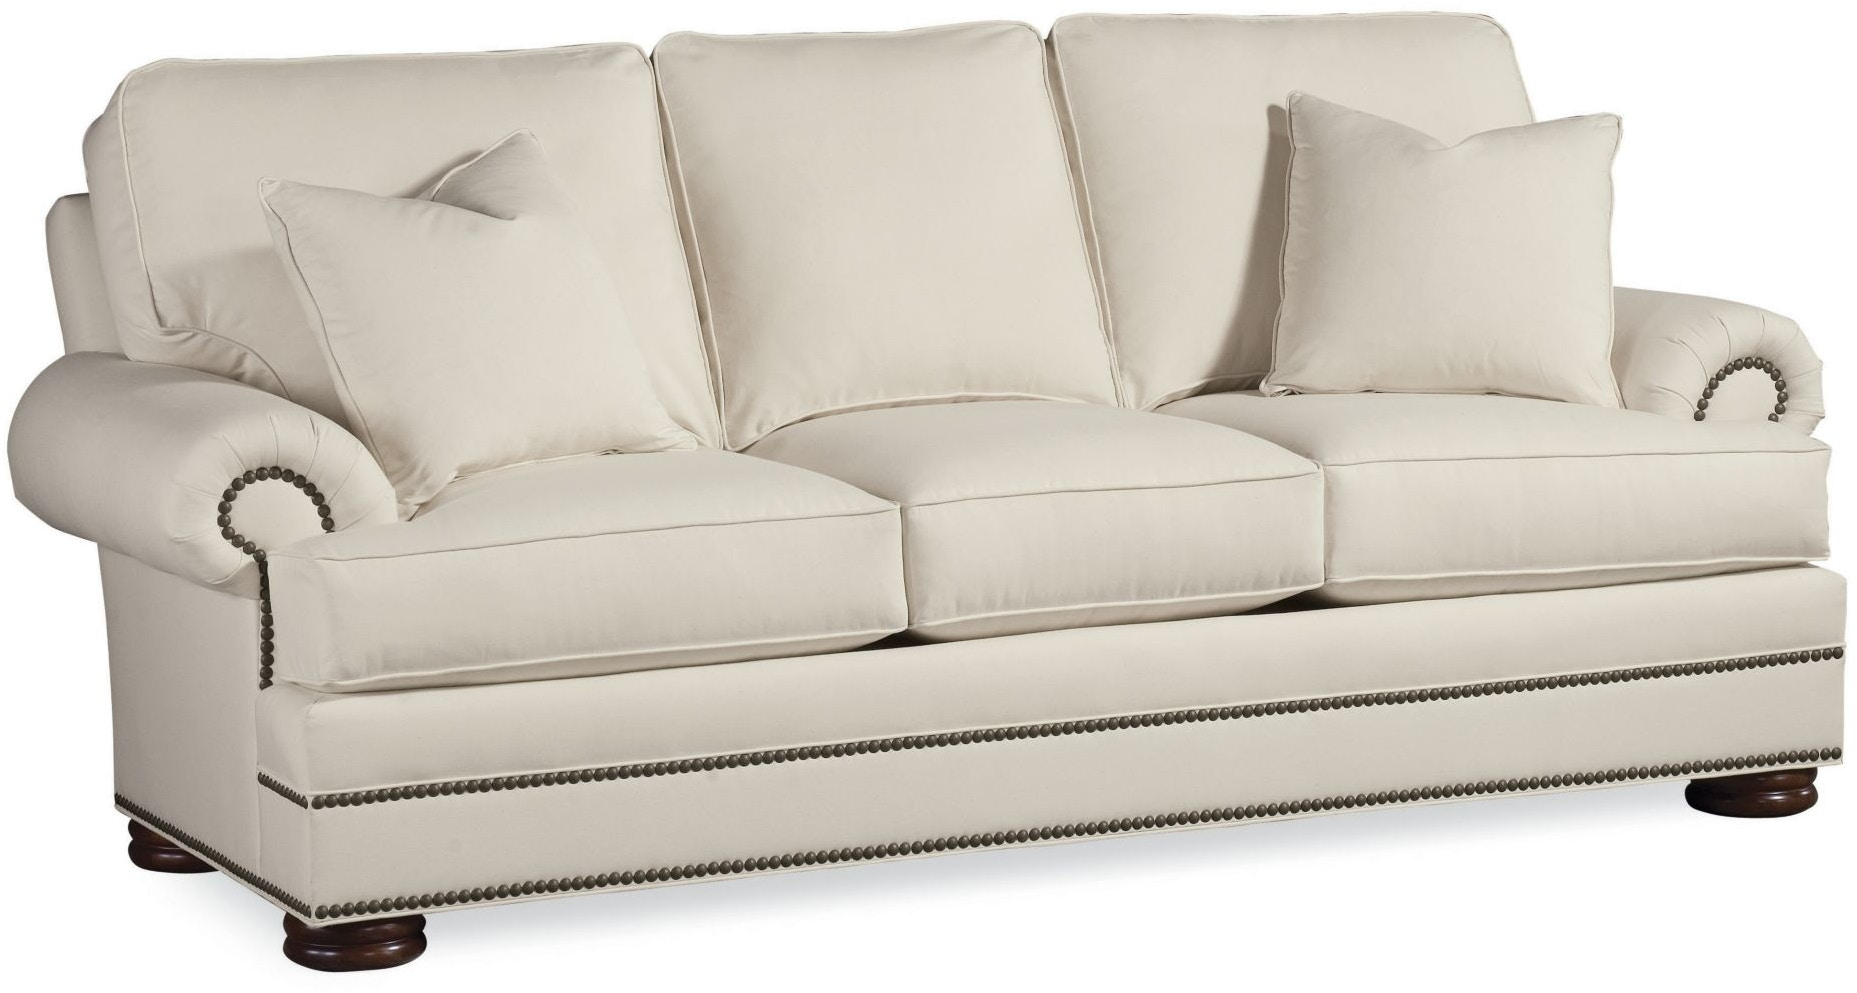 Thomasville Living Room Ashby Sofa 1459 11 Kalin Home